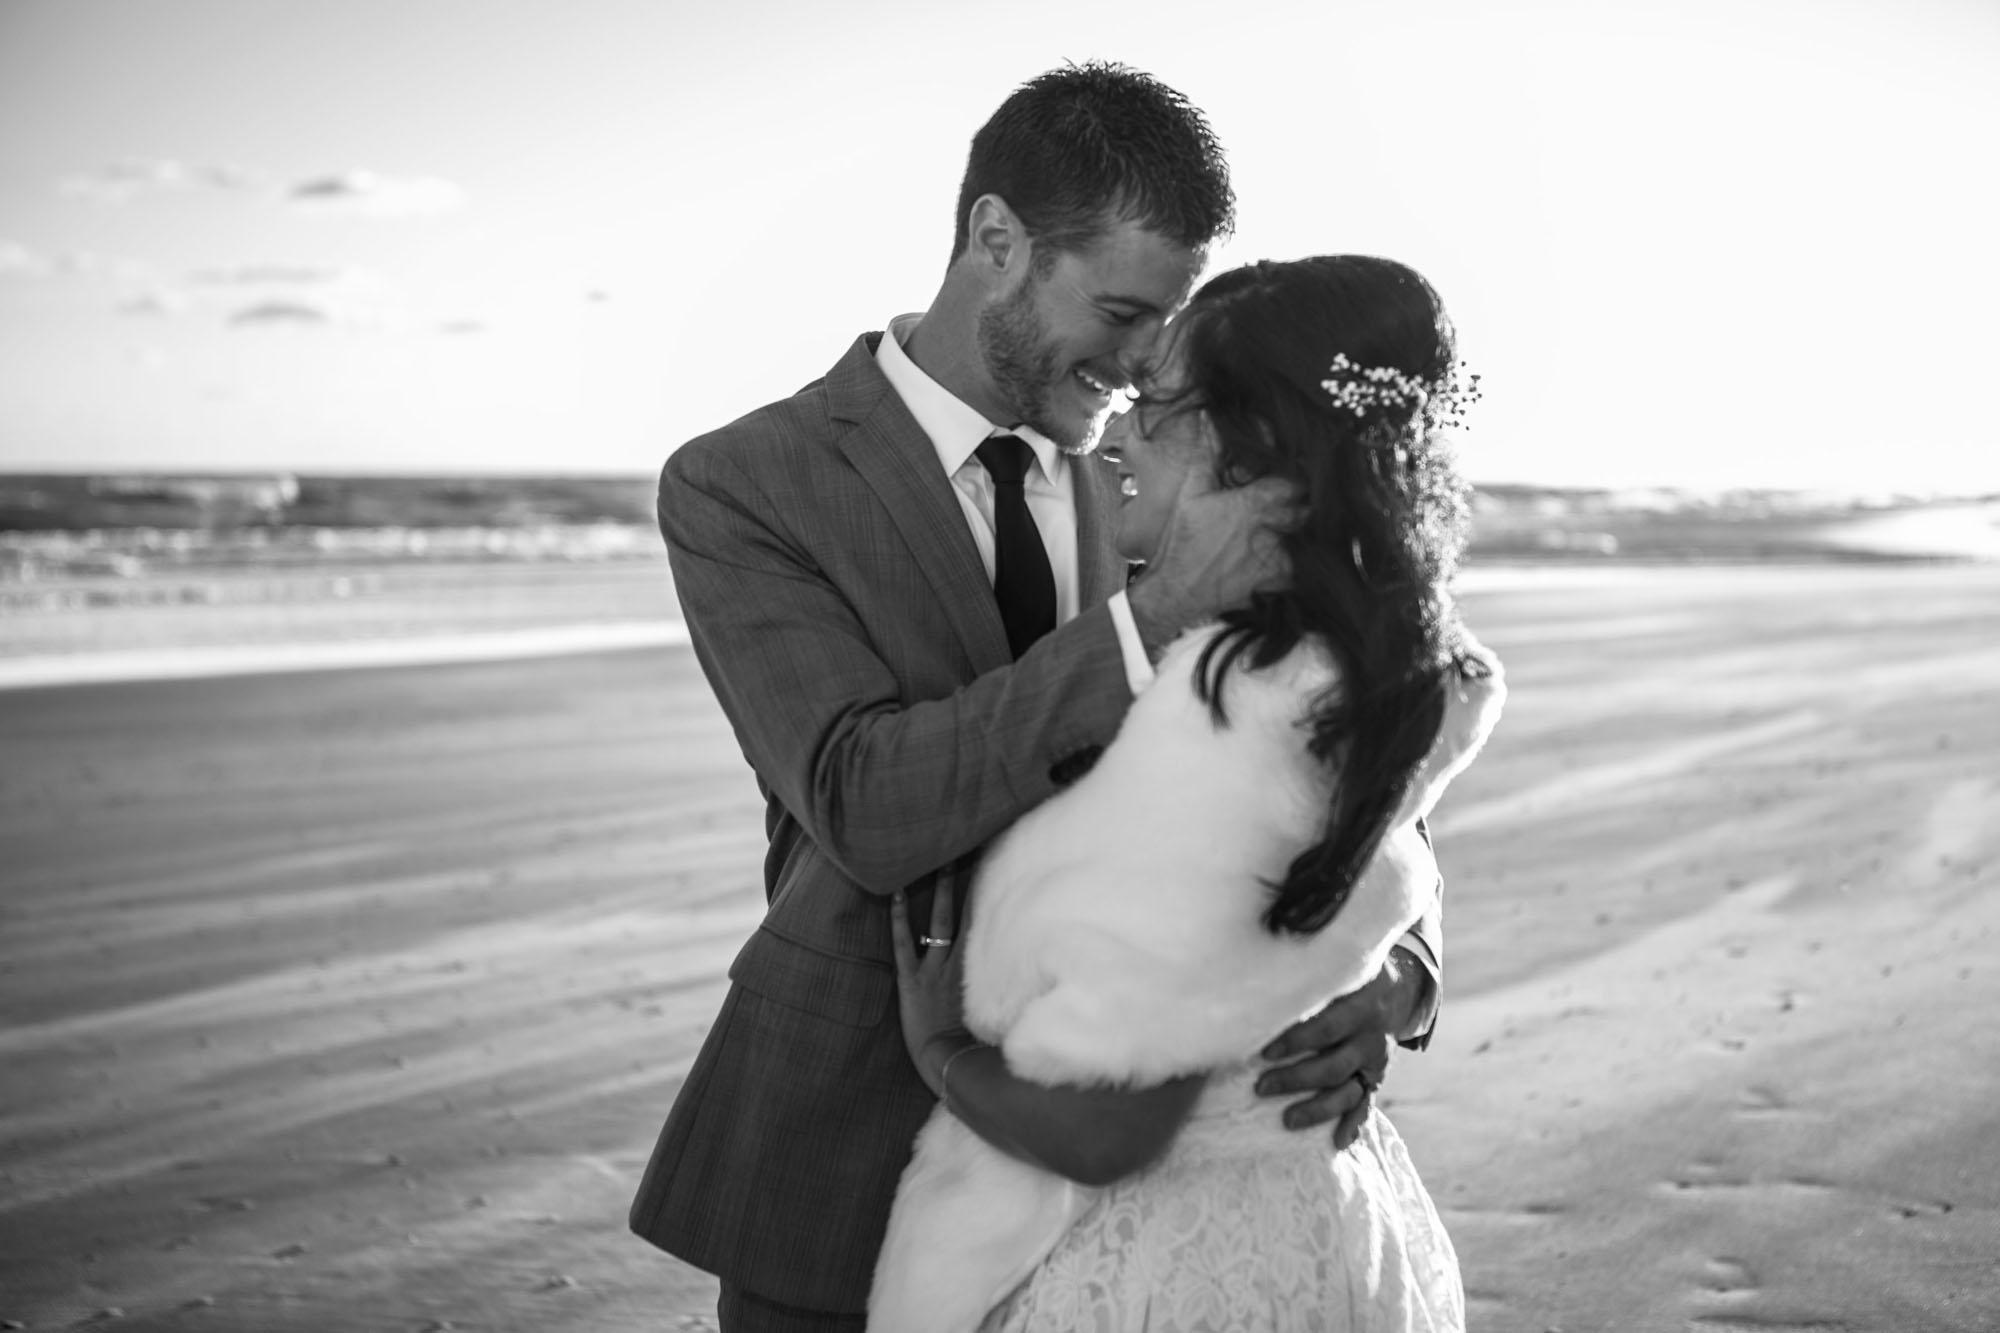 s&s-NC-Wedding-Photographer-Tiffany-Abruzzo-Ocean-Isle-Memory-Maker-Bride-&-Groom-35.jpg